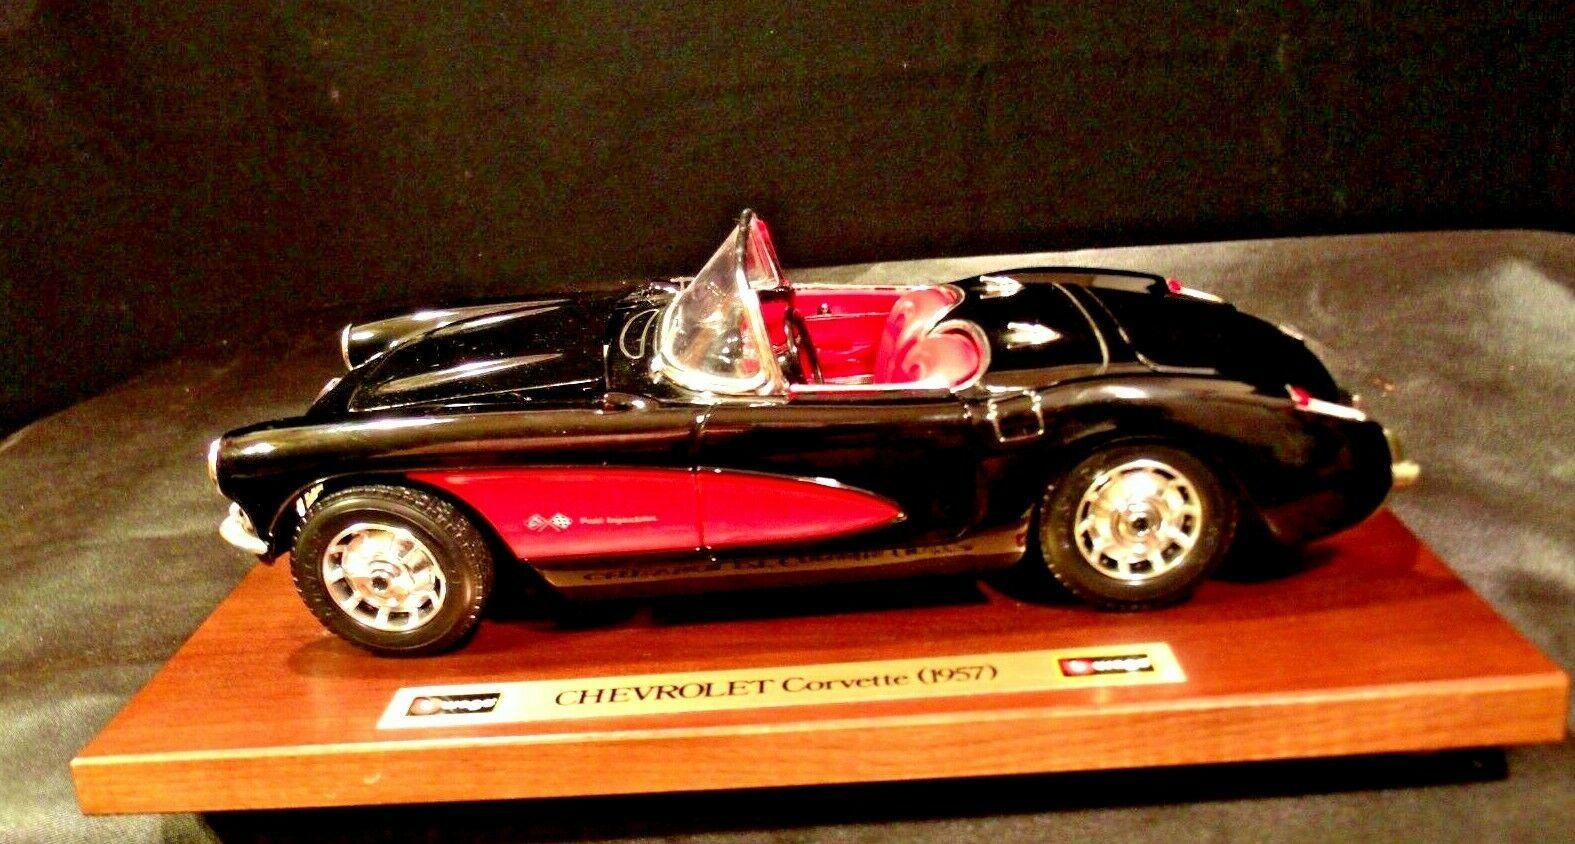 1957 Chevrolet Corvette Burago Die-cast AA-191741 Vintage Collectible